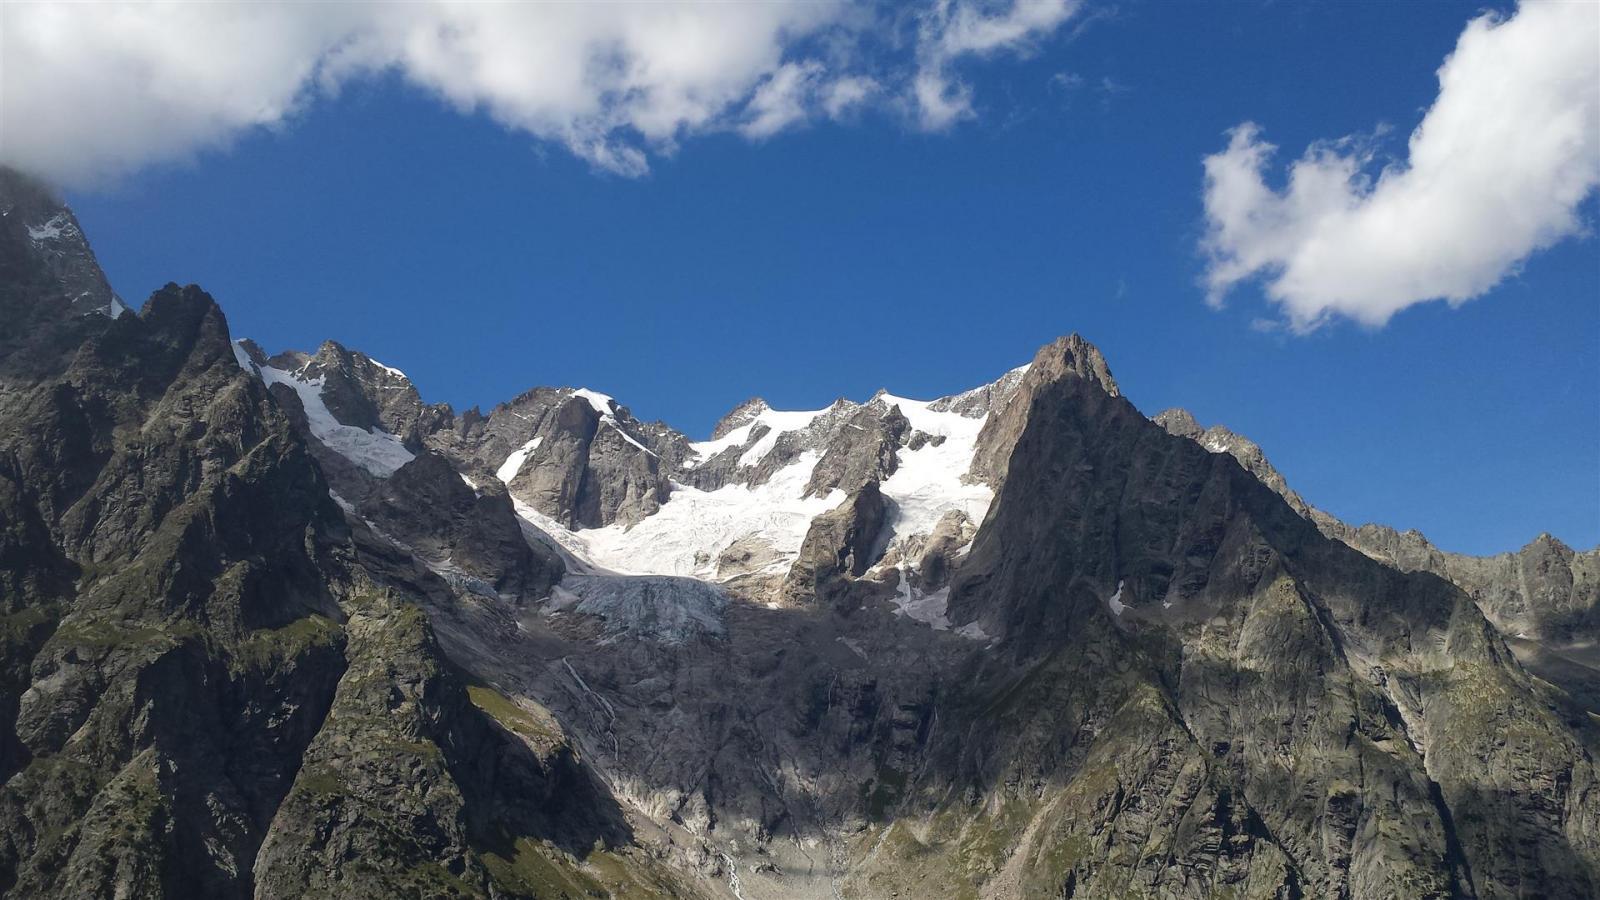 Bertone, Bonatti (Rifugi) da Planpincieux, anello 2014-08-28